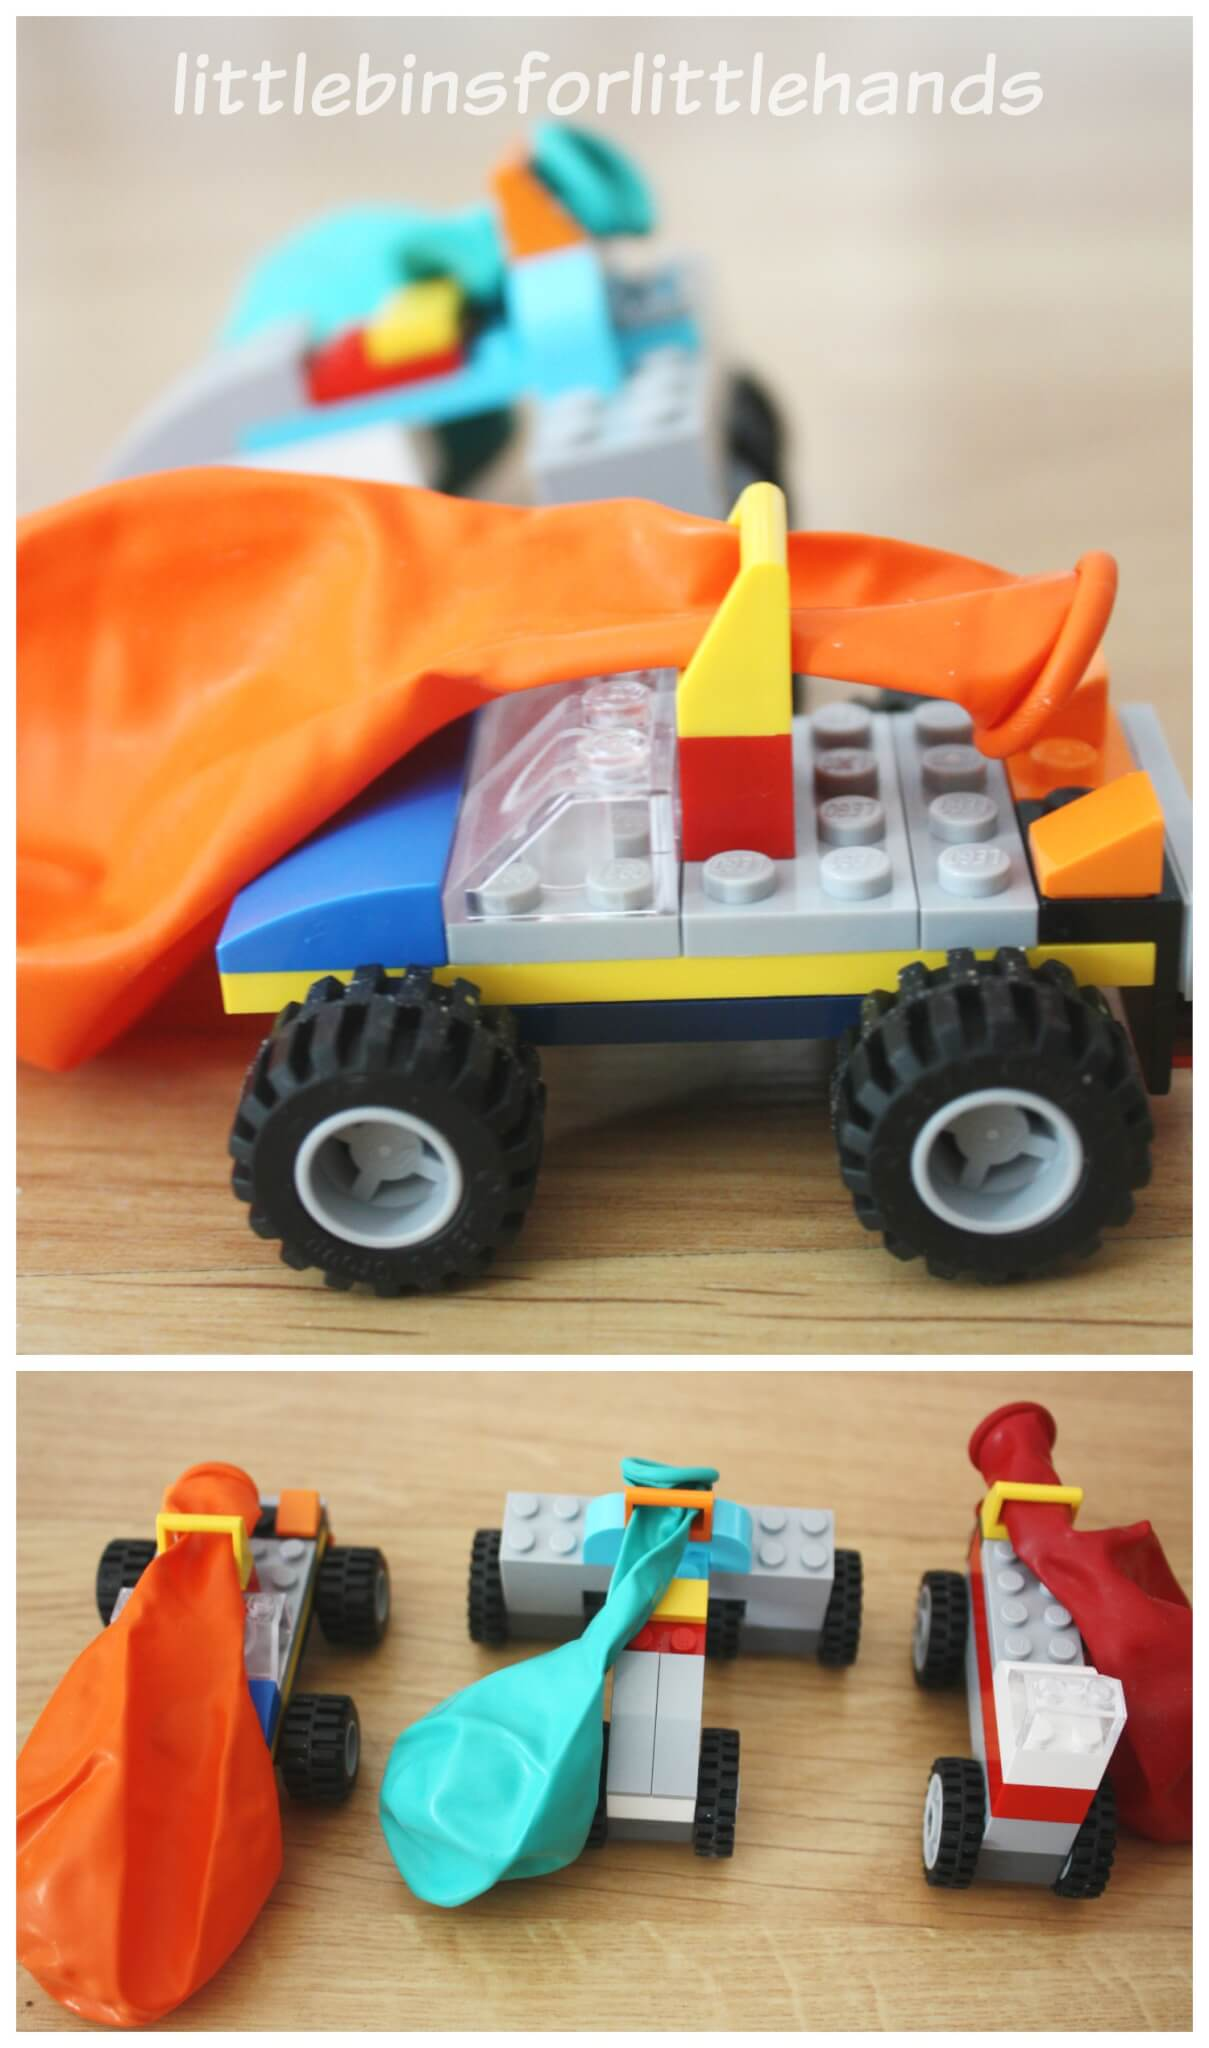 lego balloon car diy lego building kit stem activity. Black Bedroom Furniture Sets. Home Design Ideas